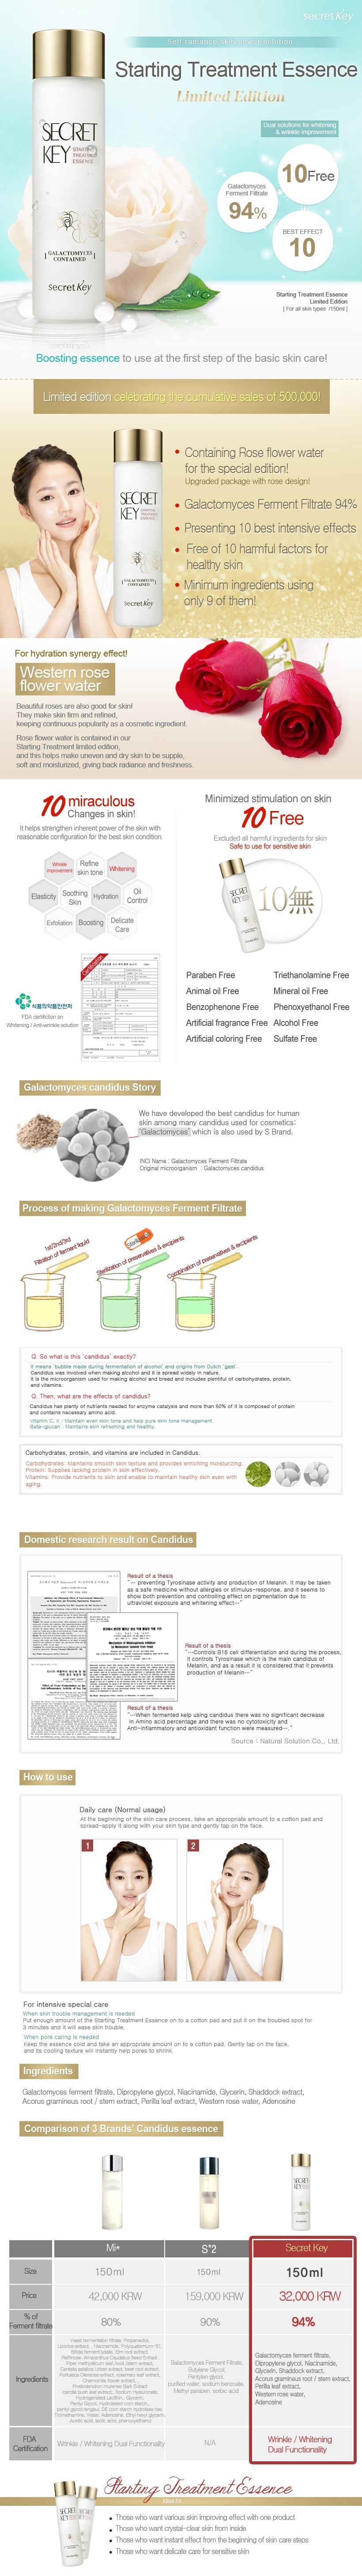 Secret Key Starting Treatment Essence Rose Edition 150ml Intl 7 Ml Specifications Of